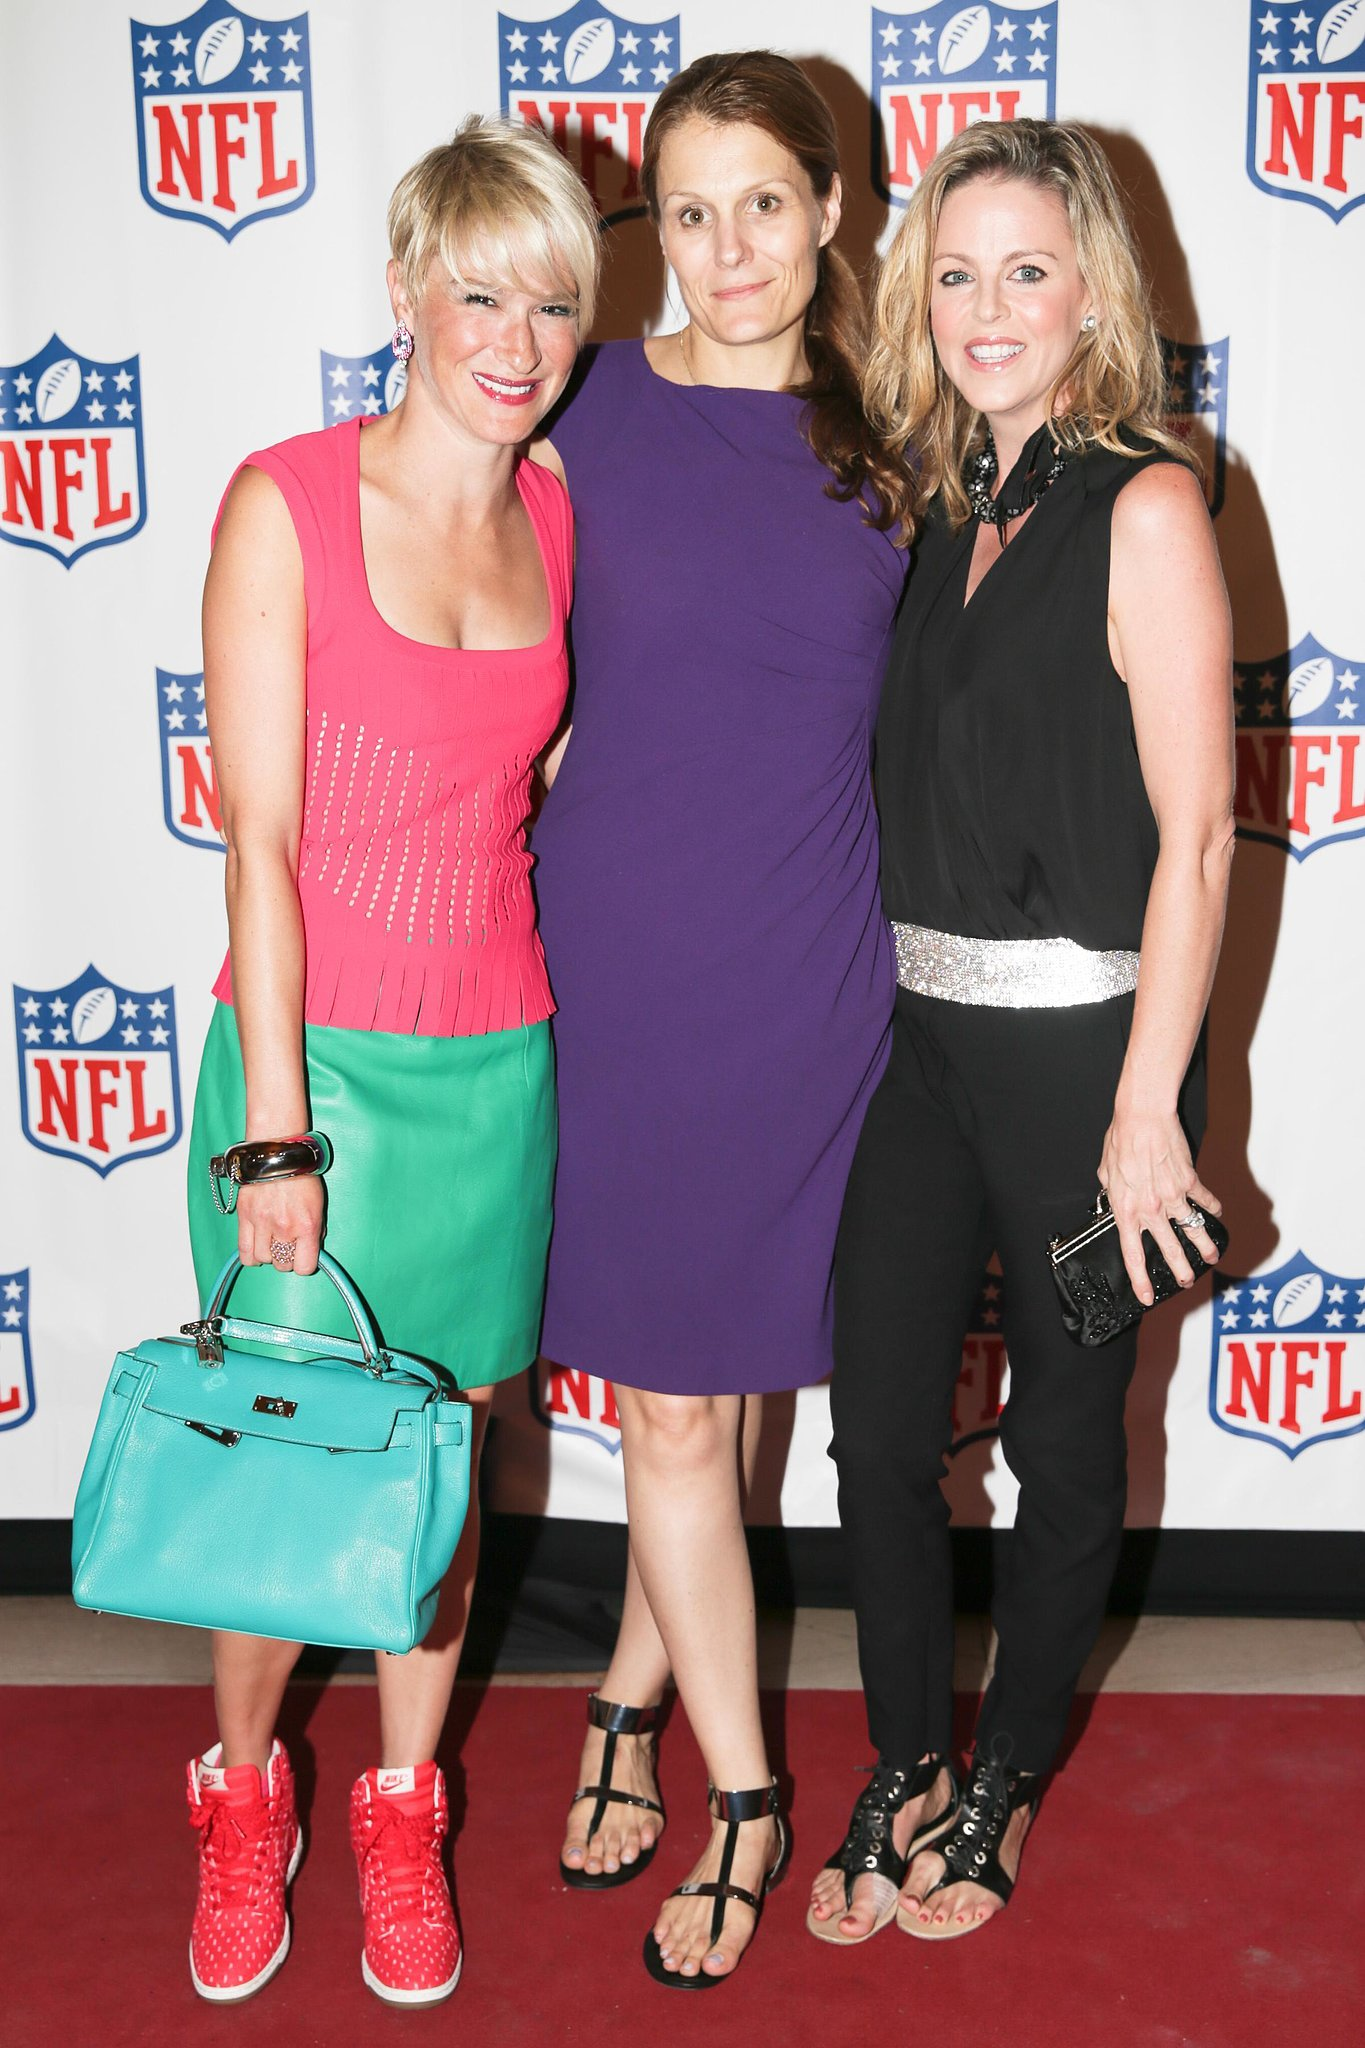 Touchdown! Julie Macklowe, Anne Vincent, and Elizabeth Petersen scored an invite to Vogue's NFL event.